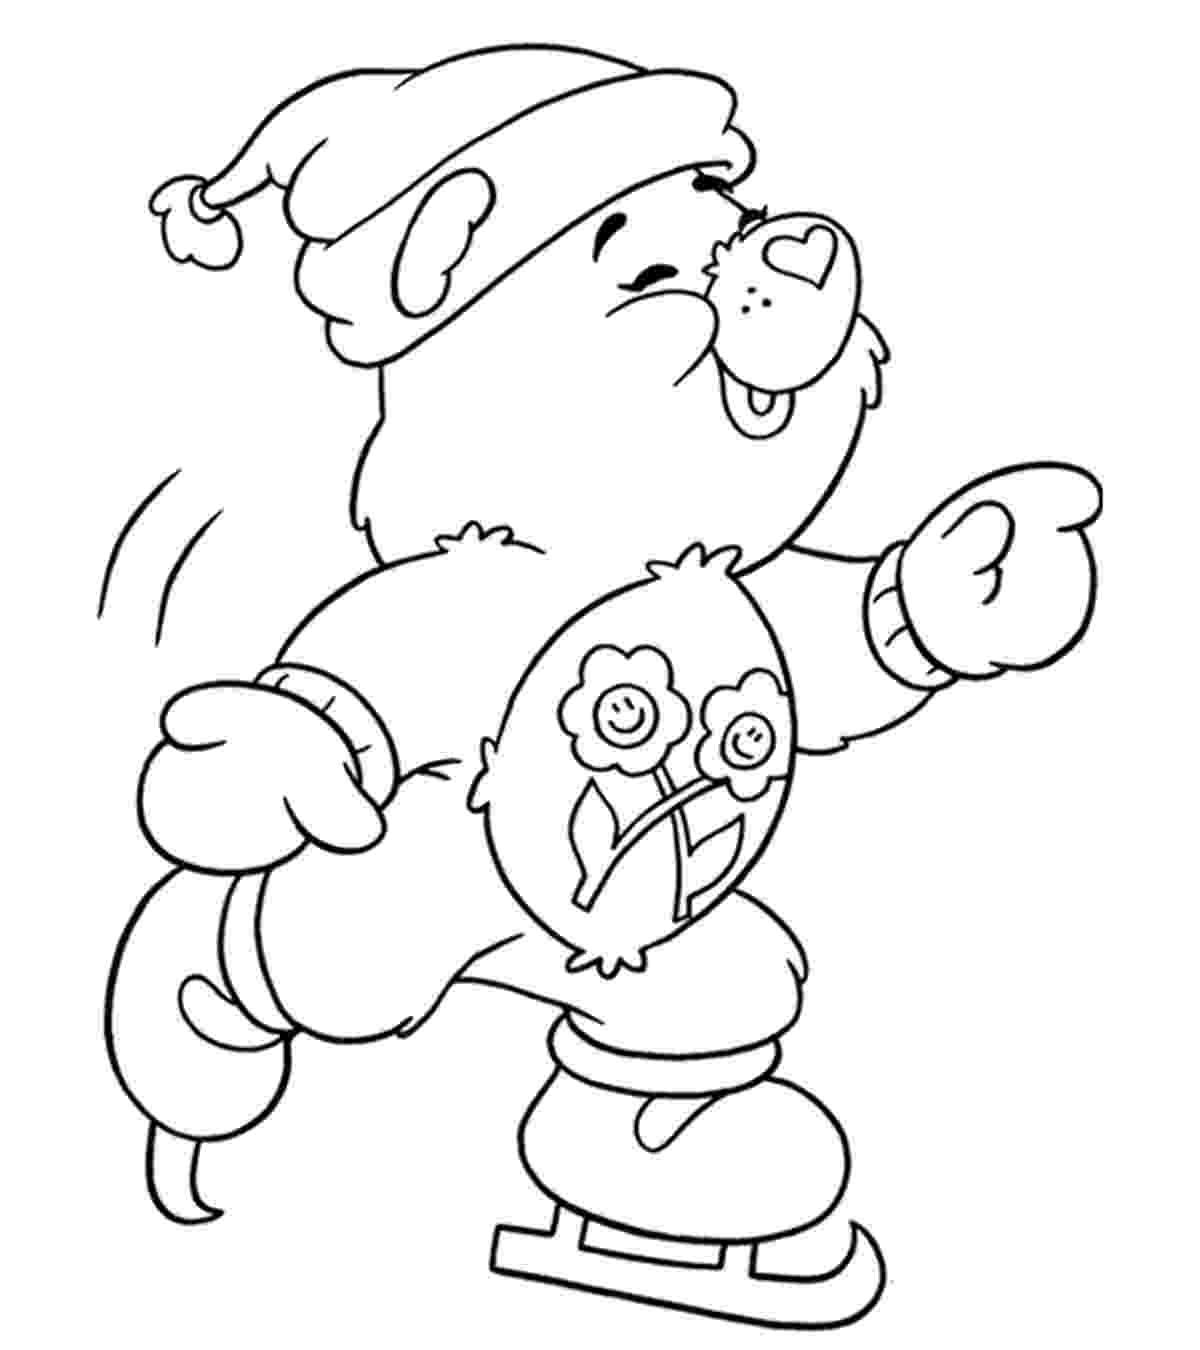 winter coloring book free printable winter coloring pages for kids book coloring winter 1 1